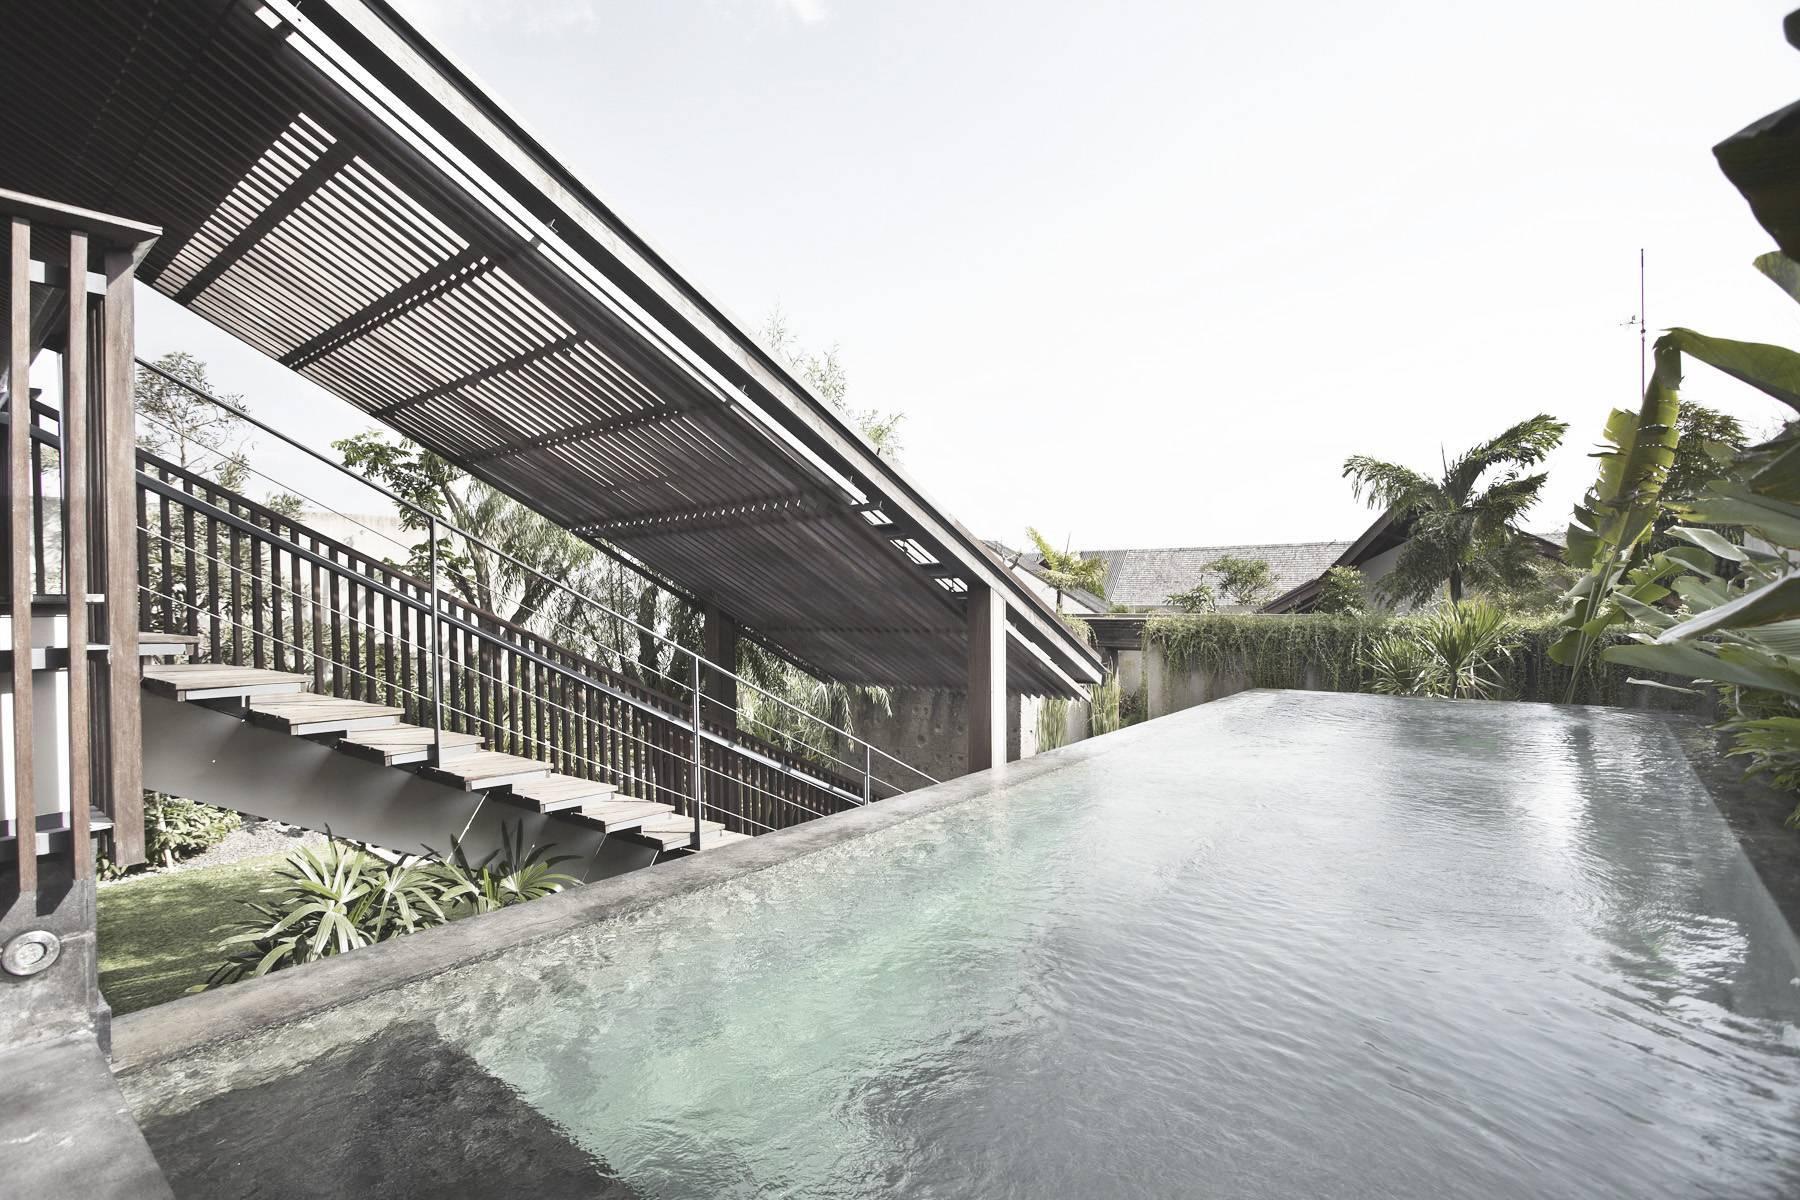 Antony Liu + Ferry Ridwan / Studio Tonton Ametis Villa Canggu, Bali Canggu, Bali Swimming Pool Modern  7983